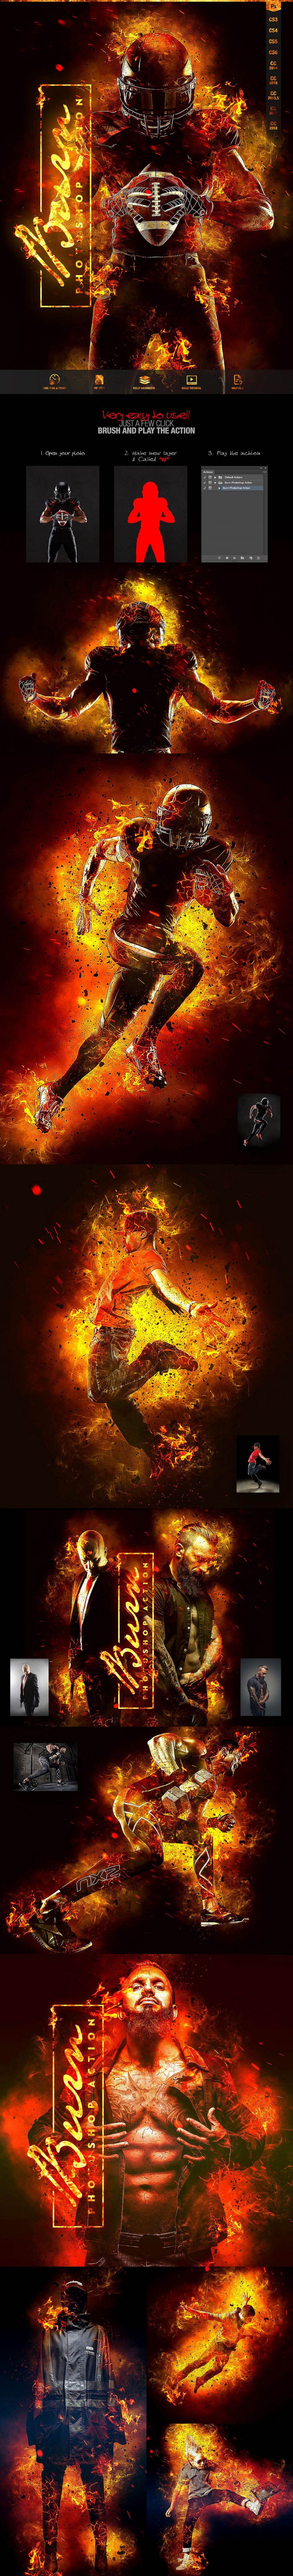 Burn Photoshop Action CS3 Design